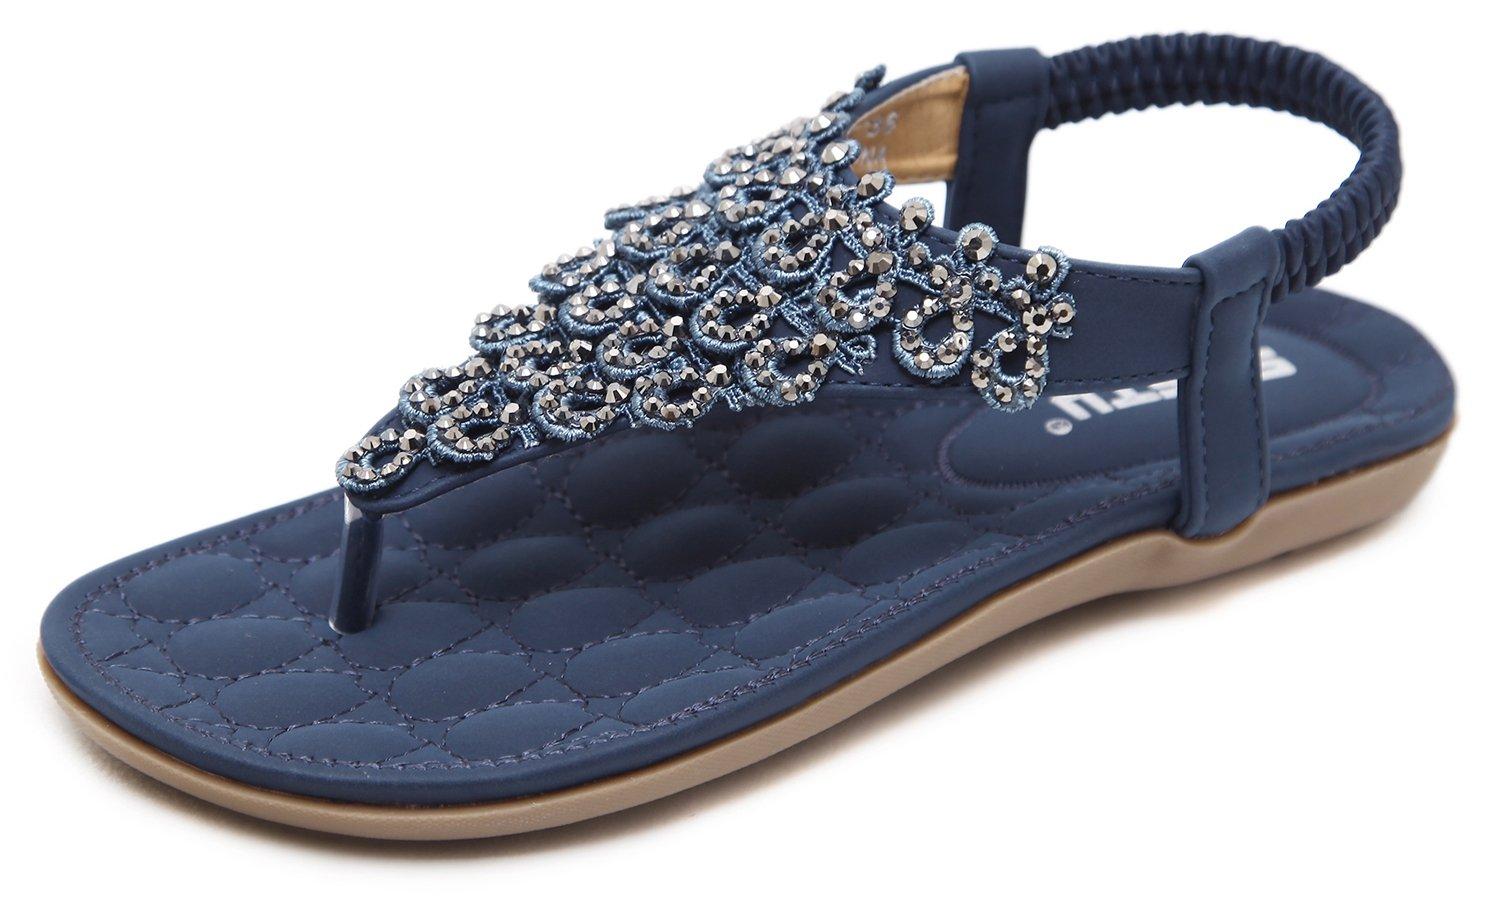 Women's Glitter Thong Flat Sandals, Navy Blue Holiday T-Strap Flip Flops Bohemian Floral Rhinestones Rivets Comfy Elastic Back Strap, Anti Skid Cushioning Low Top Beach Wear Shoes 2018 Summer Match,Navy Blue,8 M US